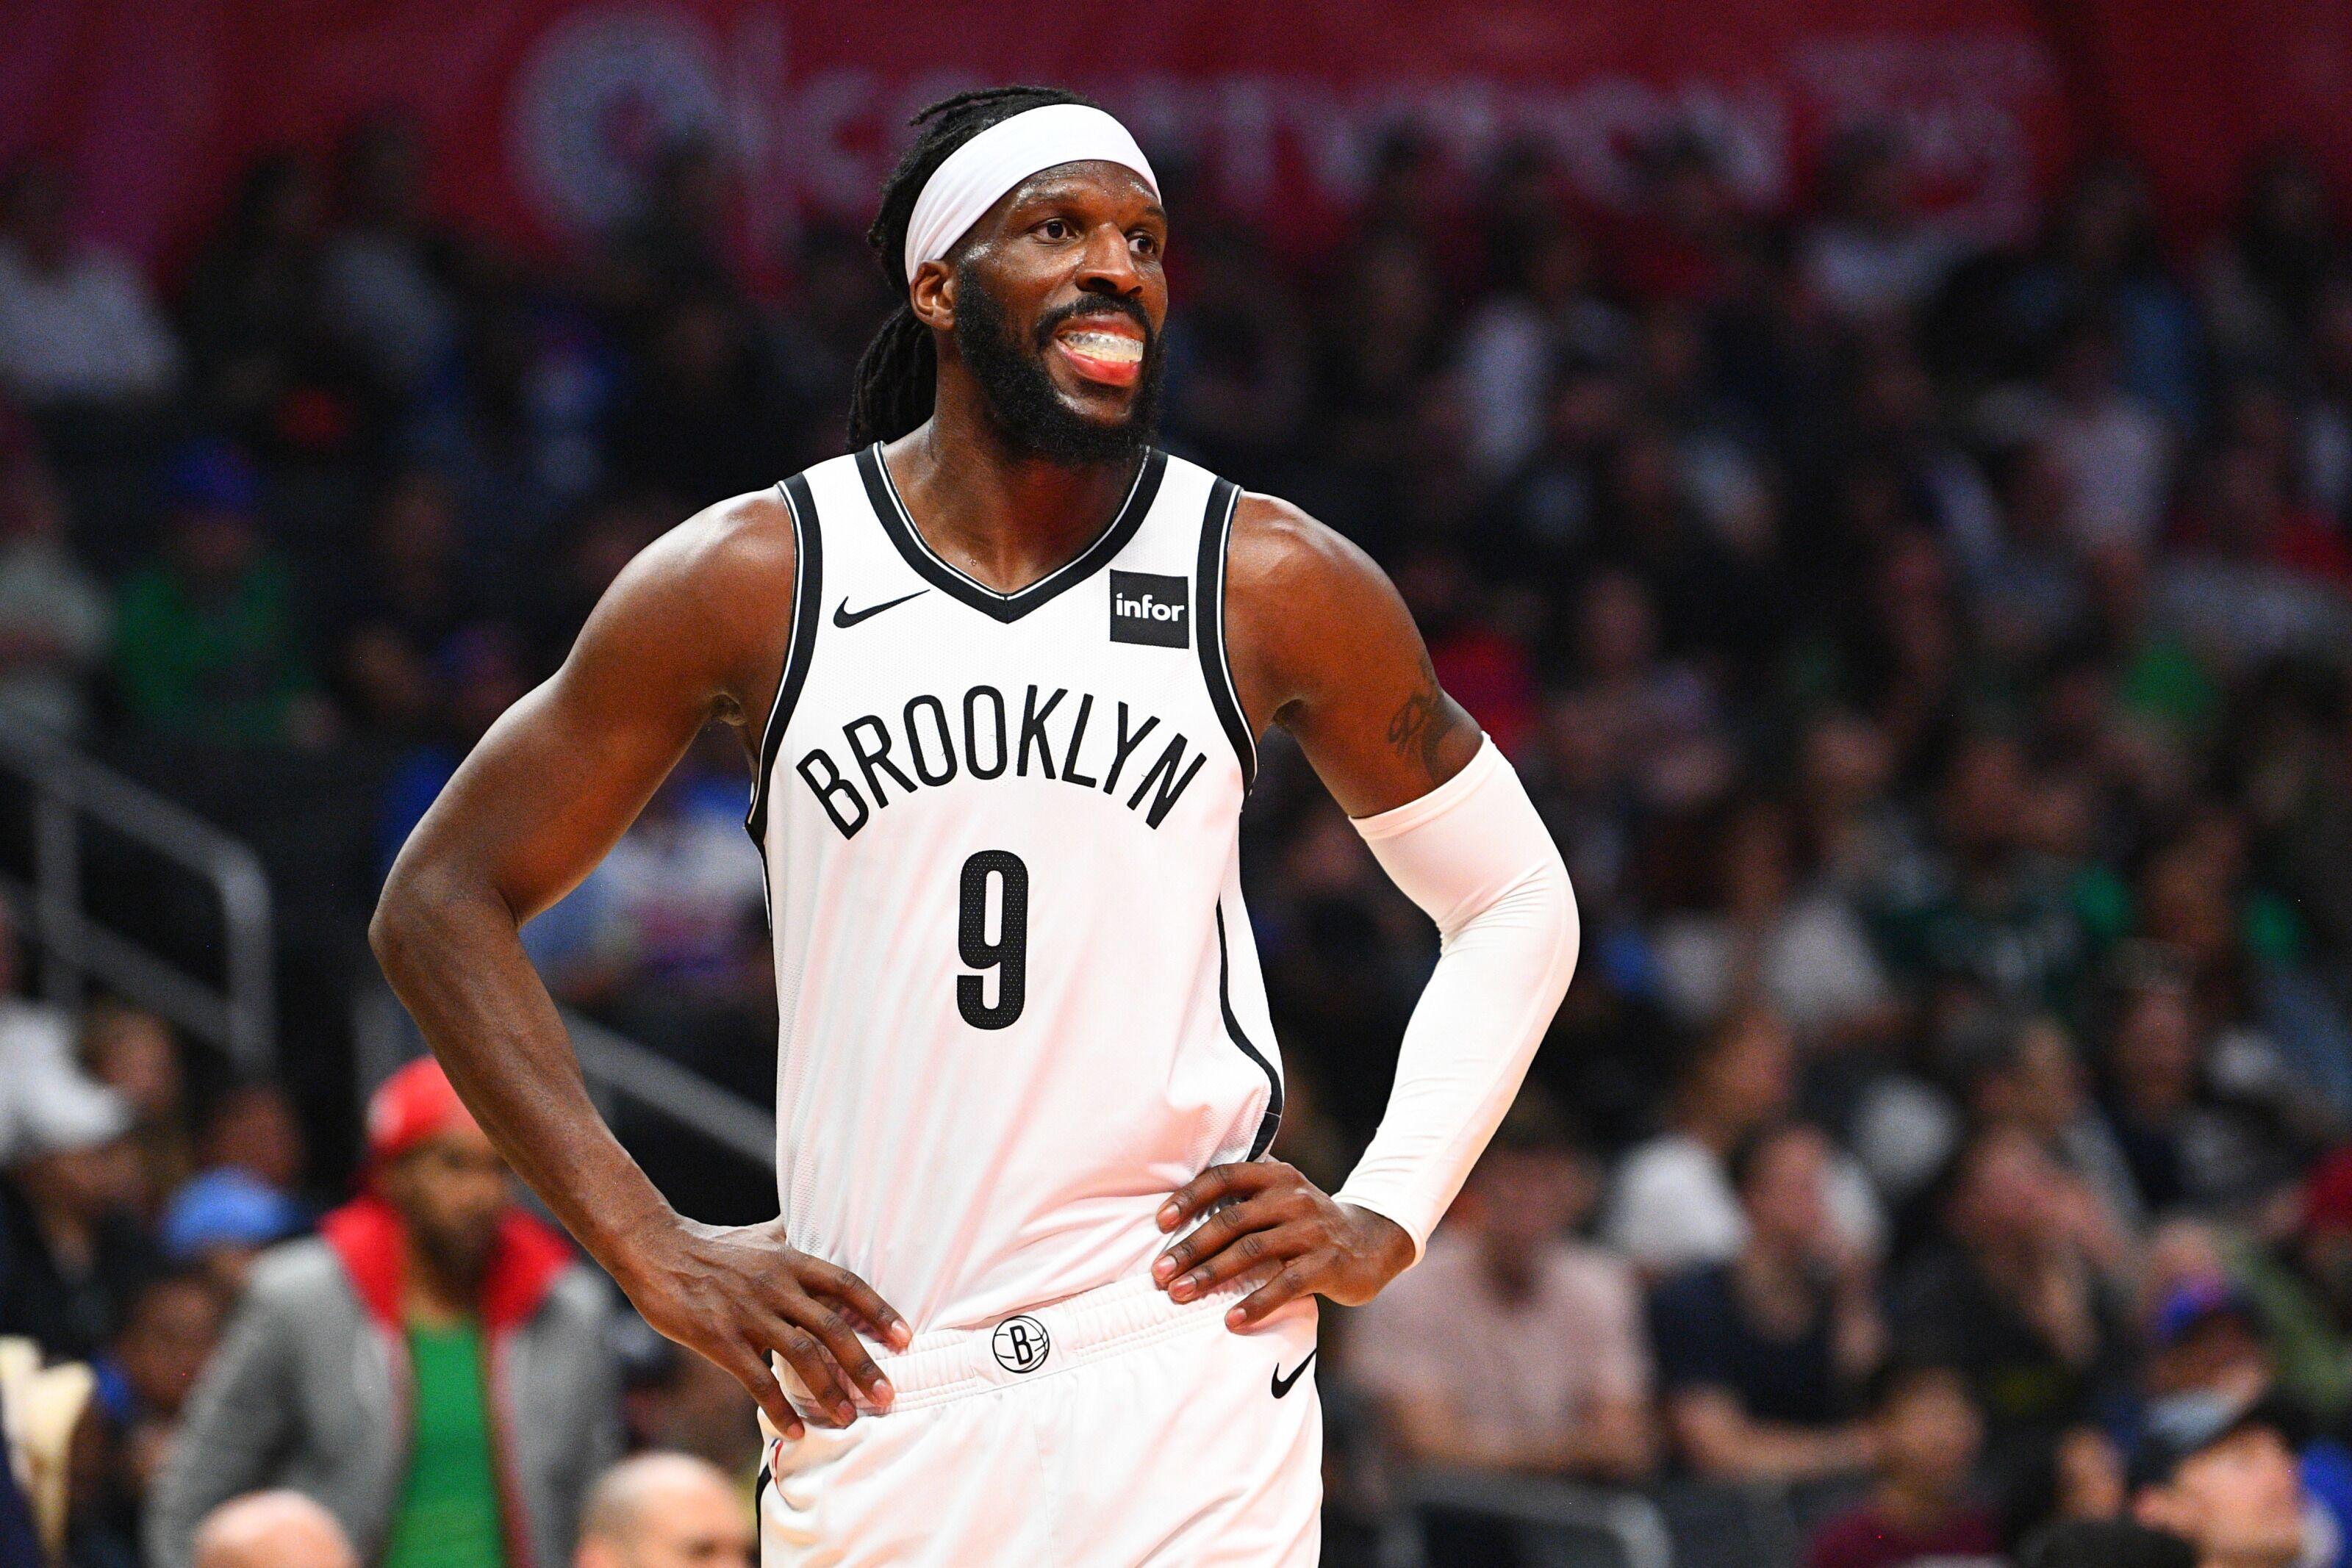 Milwaukee Bucks Rumors: DeMarre Carroll held Bucks talks before Spurs deal